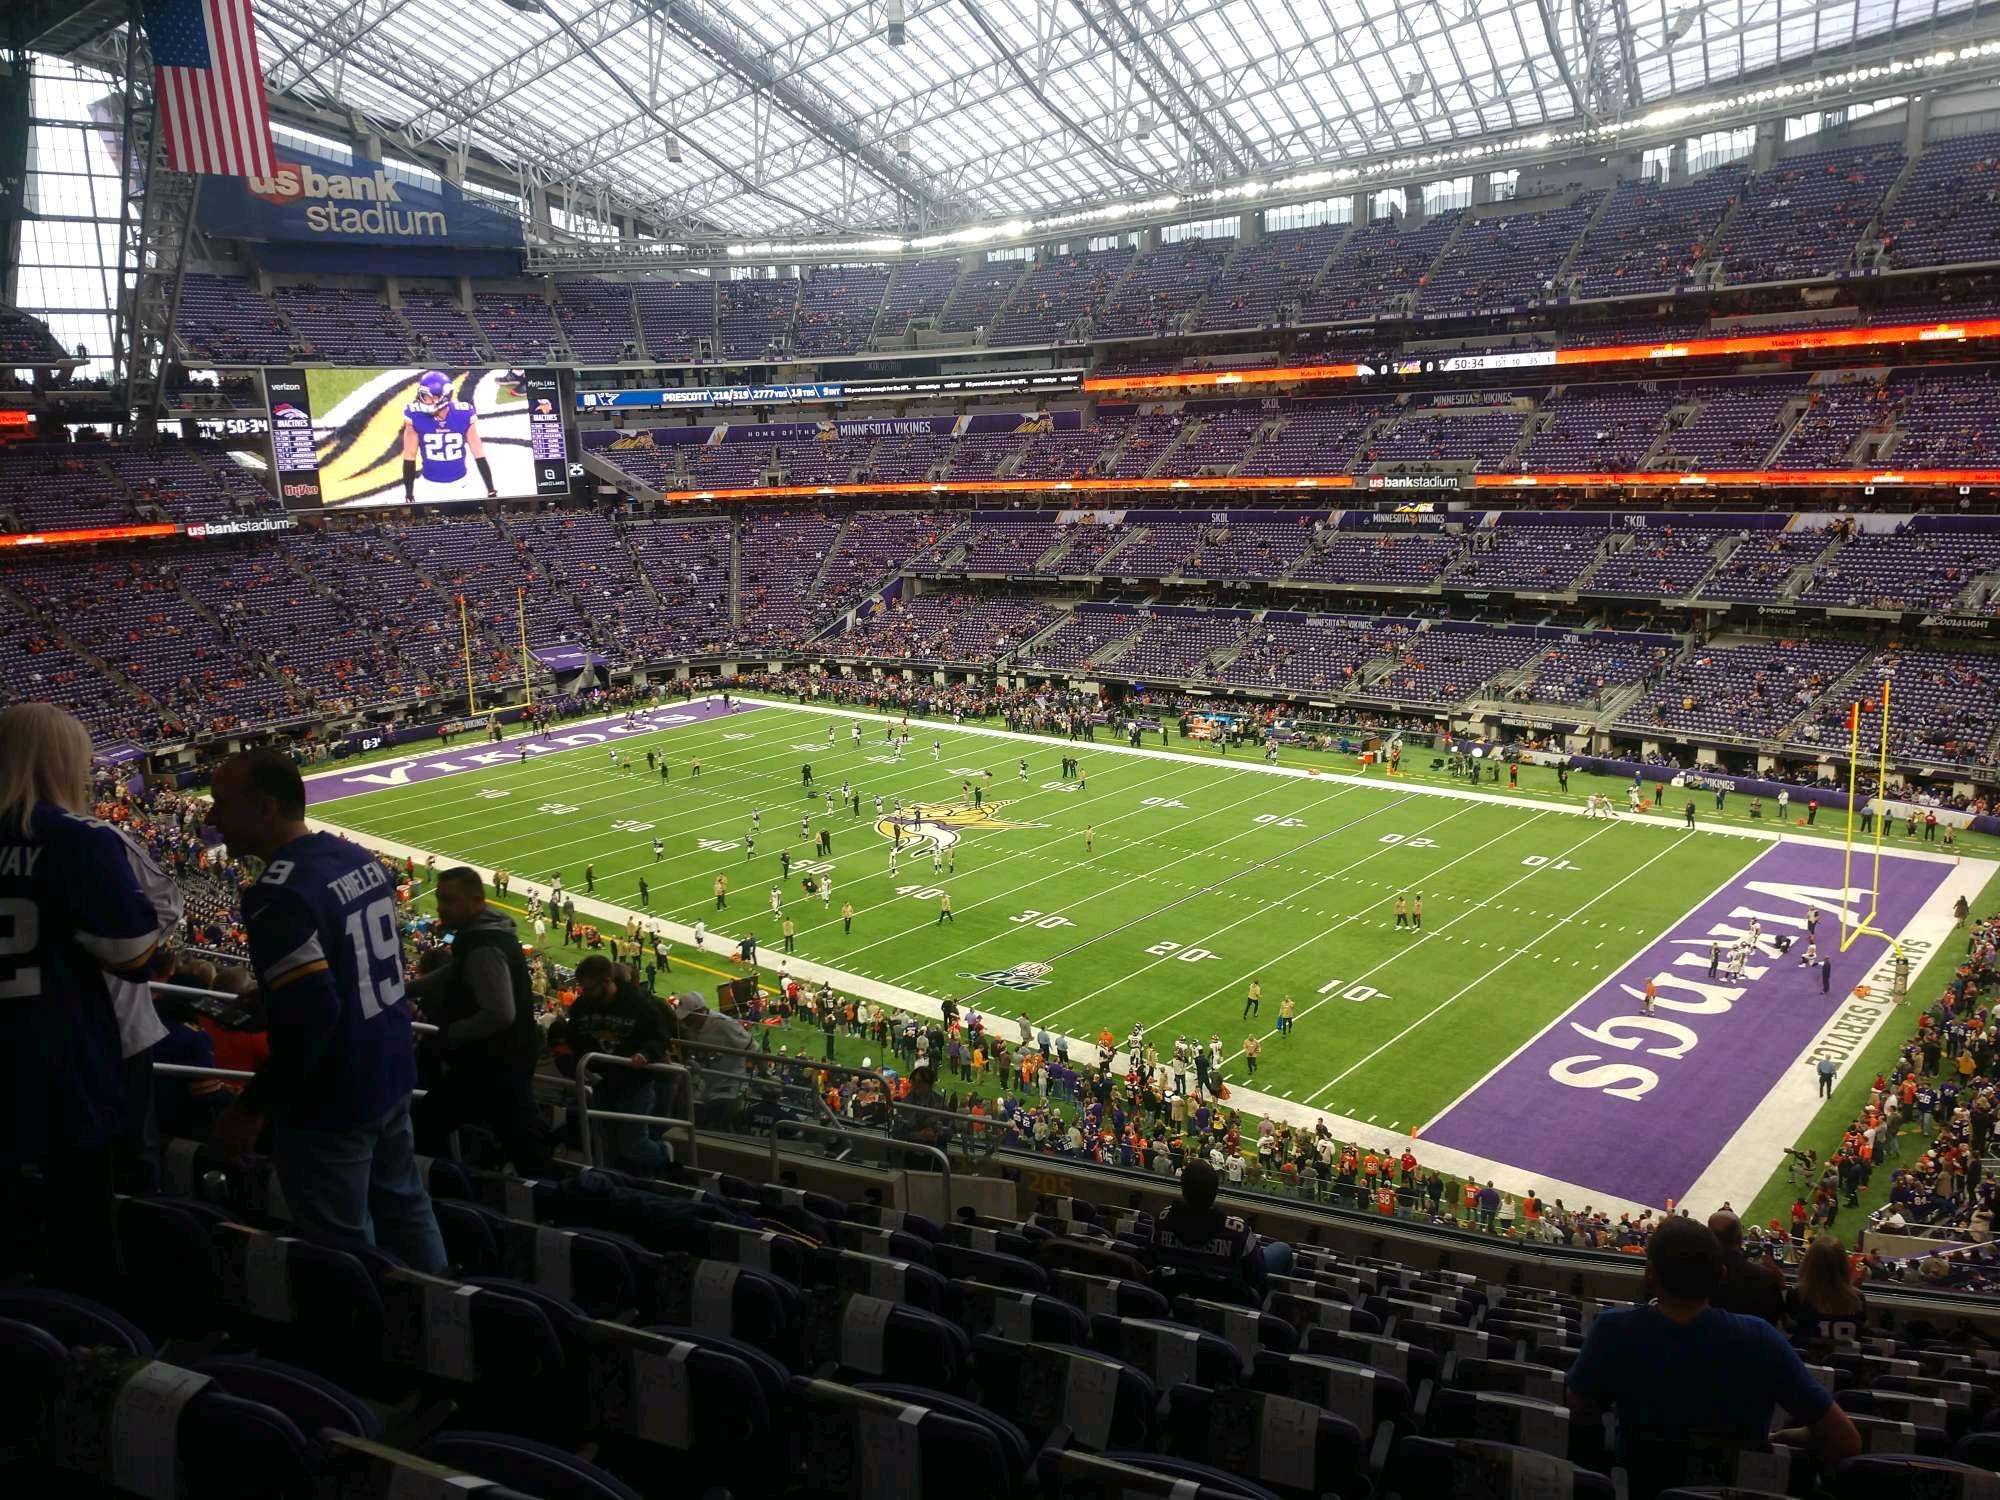 U.S. Bank Stadium Section 205 Row 13 Seat 11